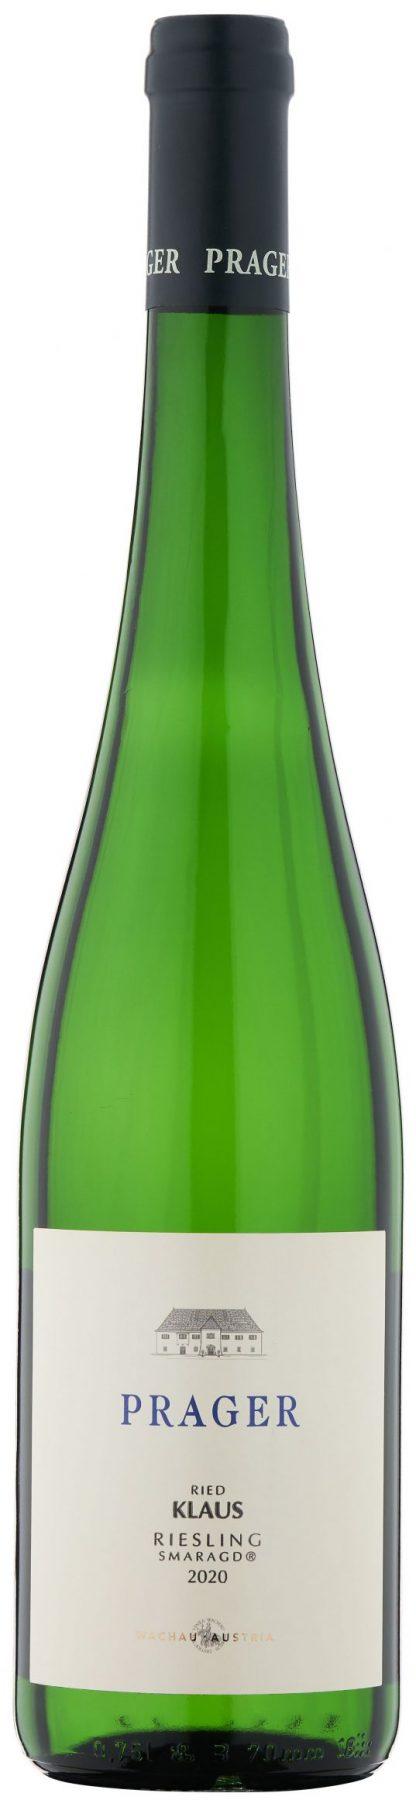 Prager - Riesling Smaragd Ried Klaus 2020